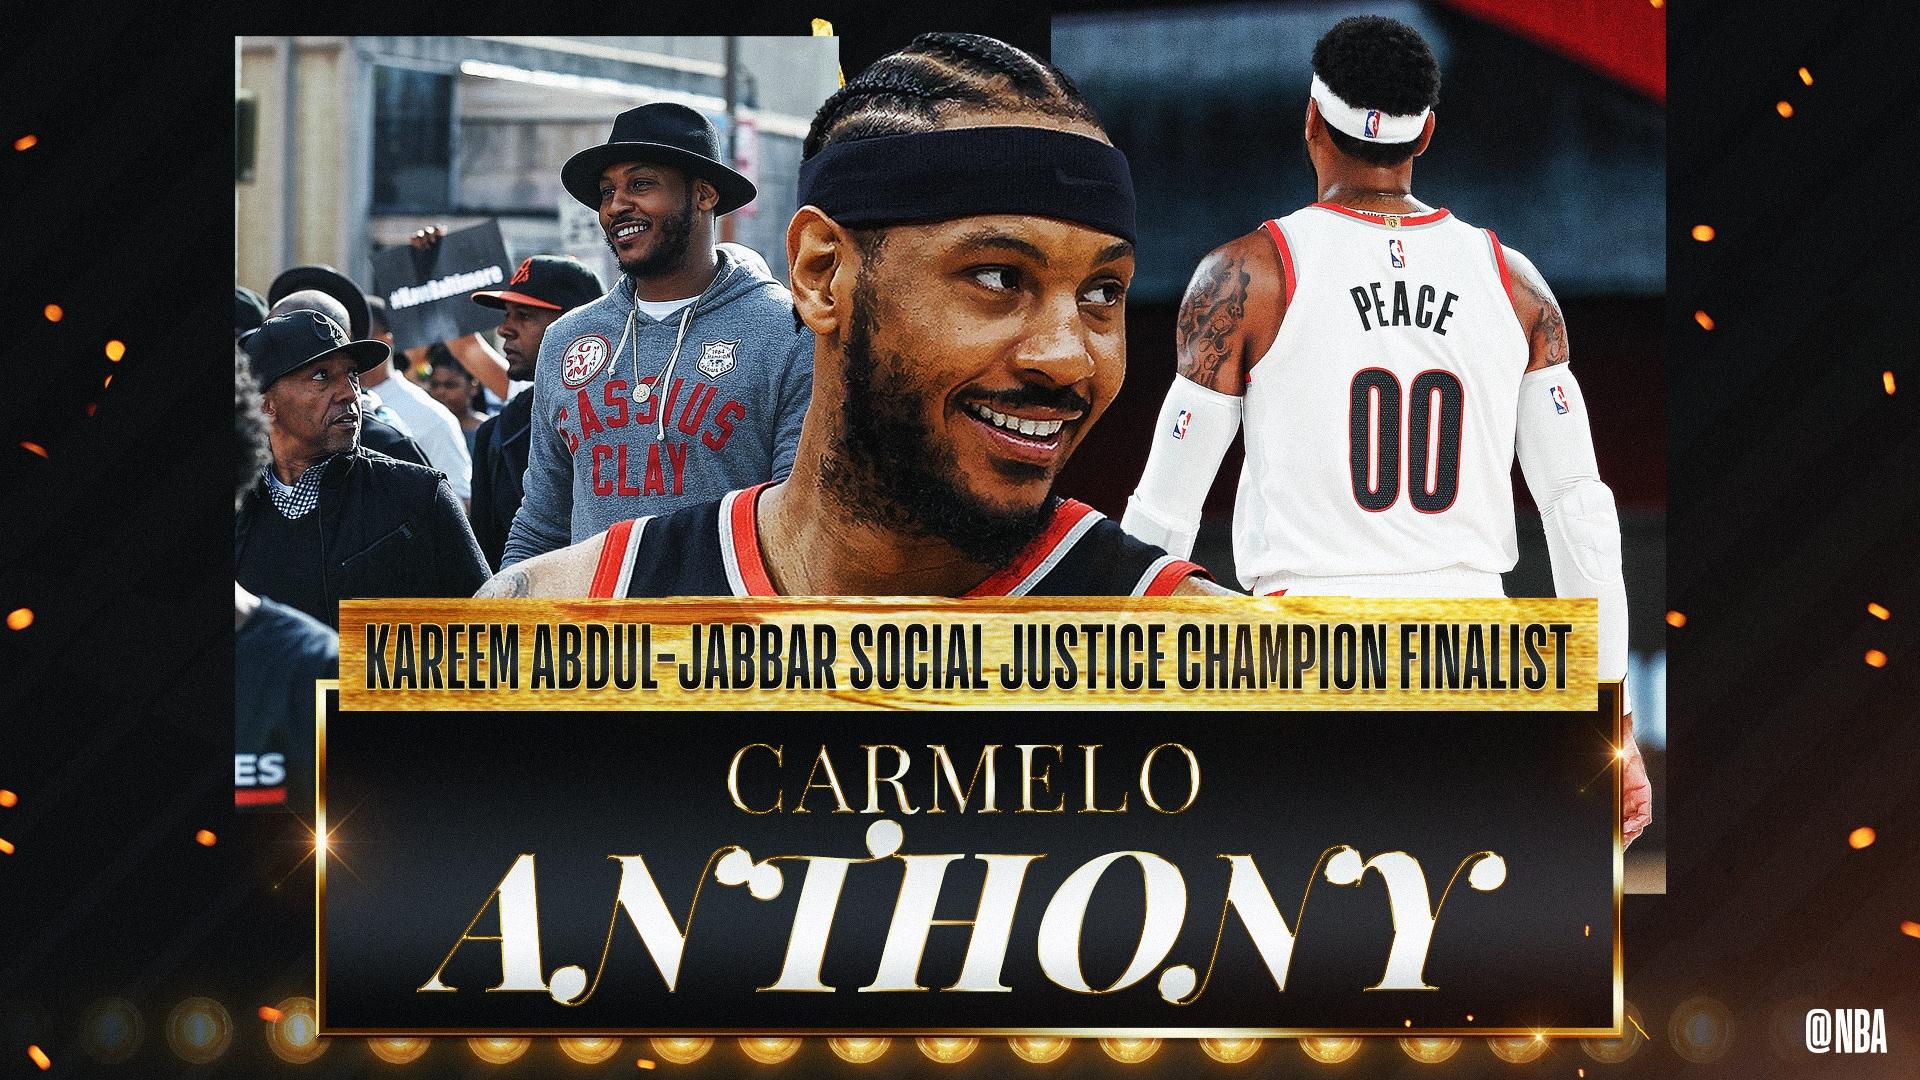 Kareem Abdul-Jabbar Social Justice Champion Finalist: Carmelo Anthony